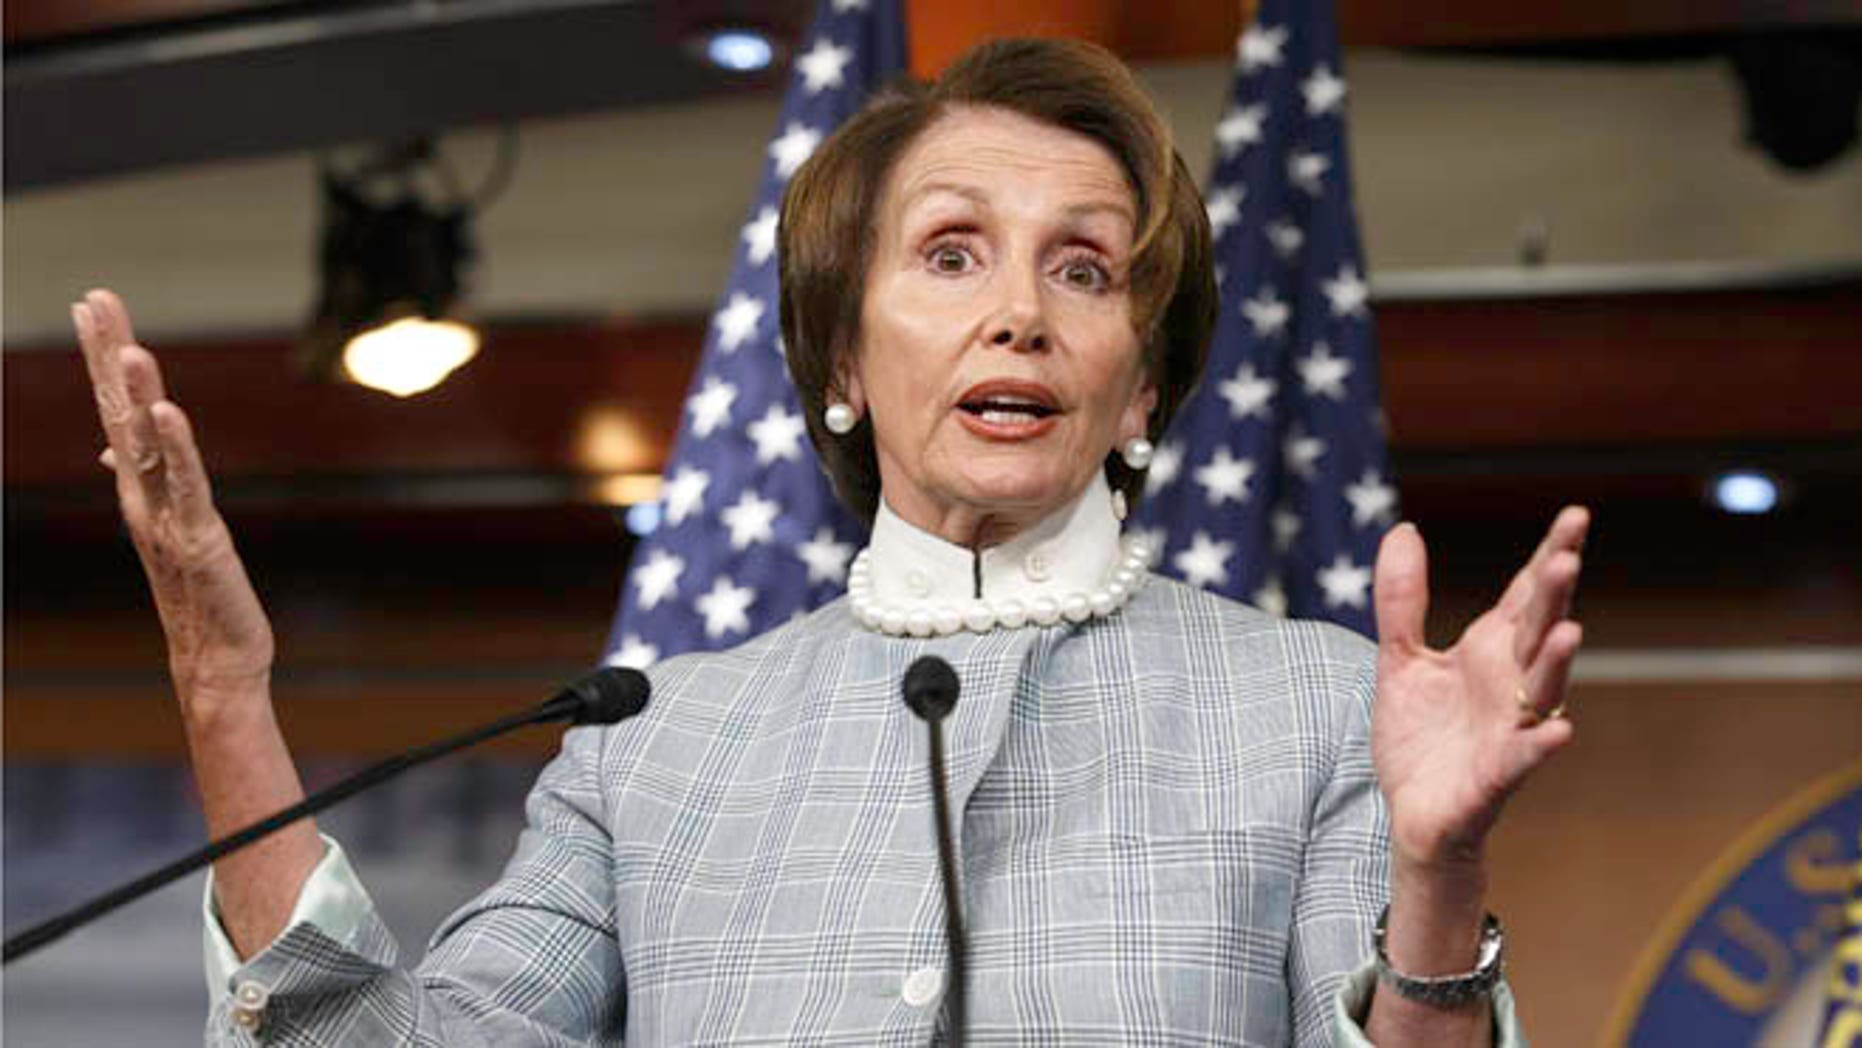 June 12, 2014: House Minority Leader Nancy Pelosi speaks on Capitol Hill.